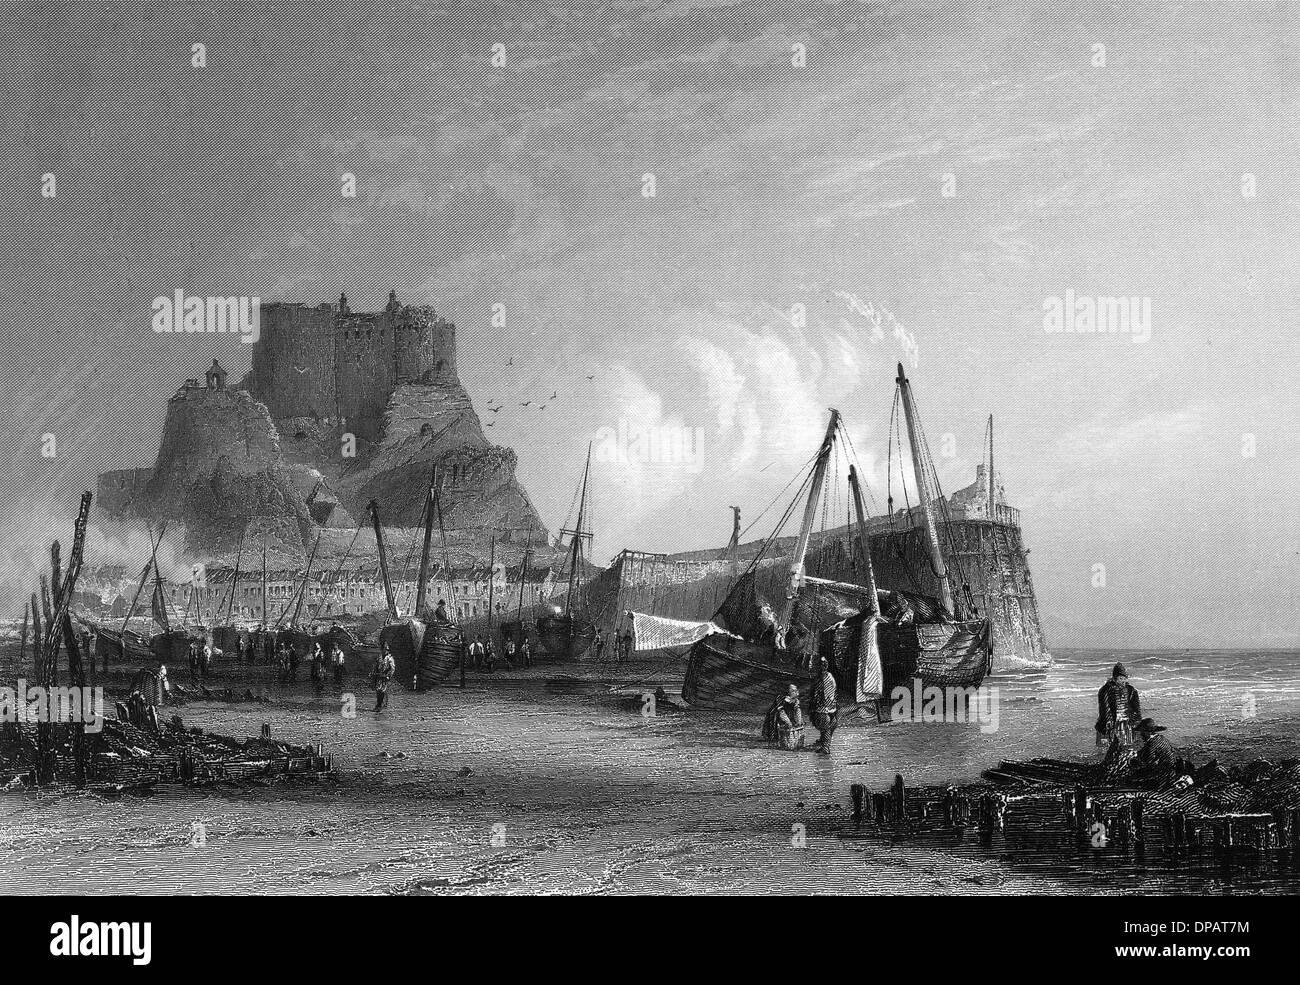 JERSEY/MONT ORGUEIL 1835 - Stock Image